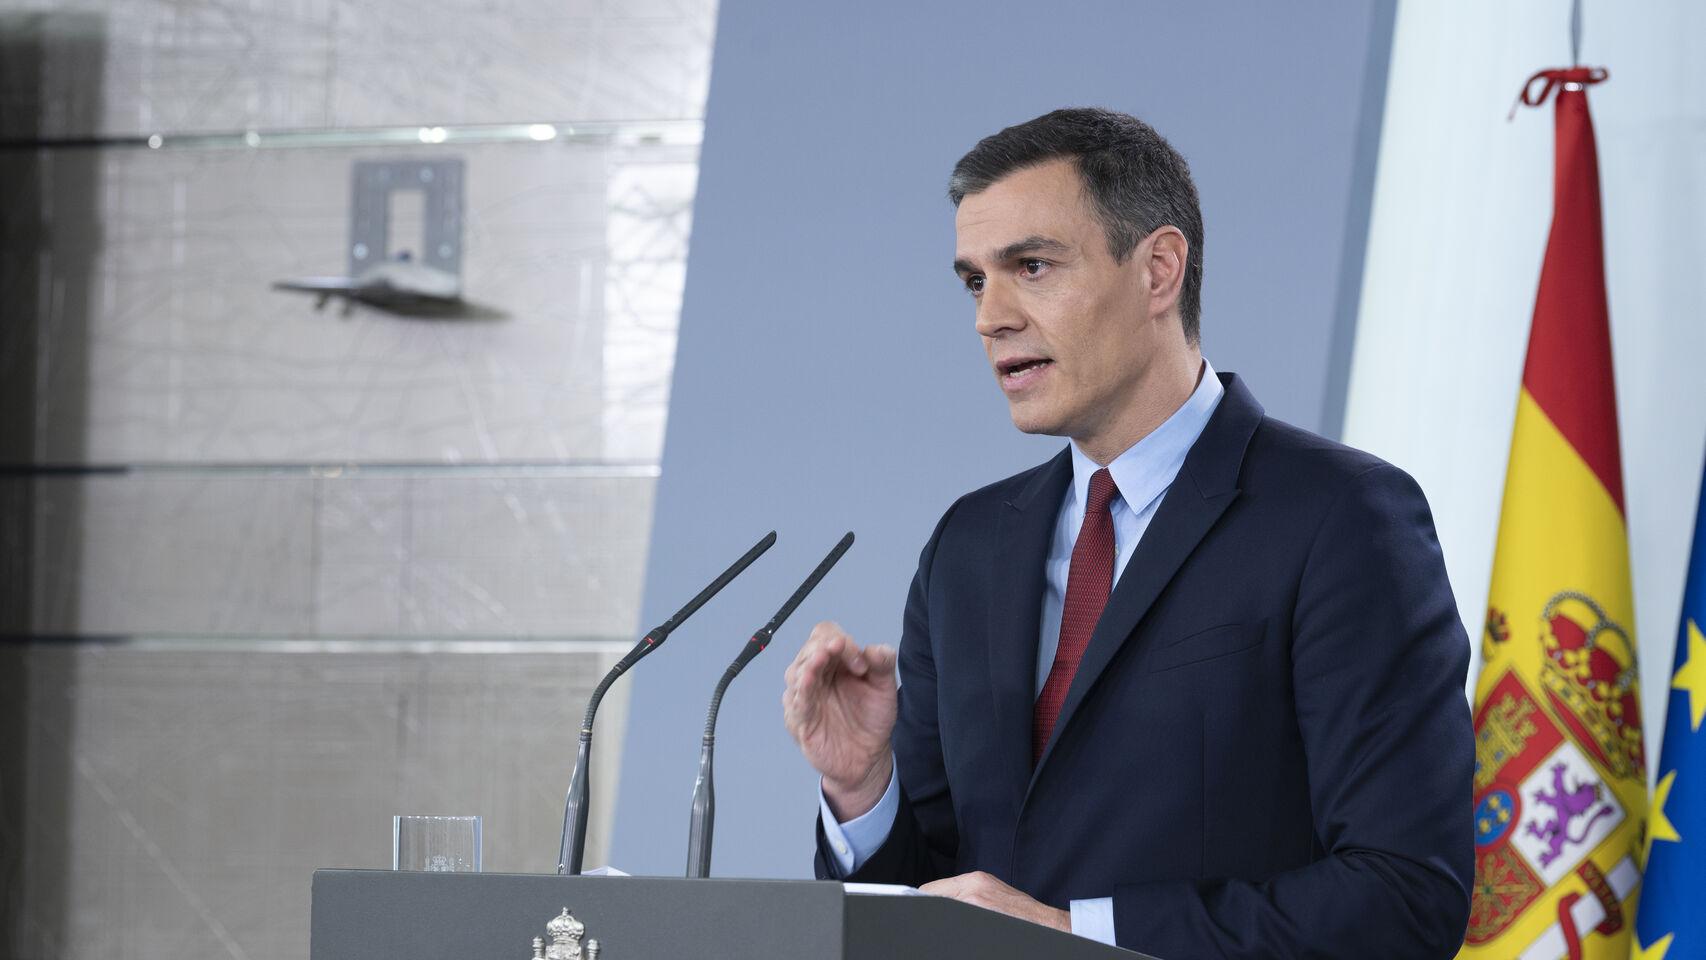 """Ley Mordaza"": Quinto aniversario e intacta de reformas"